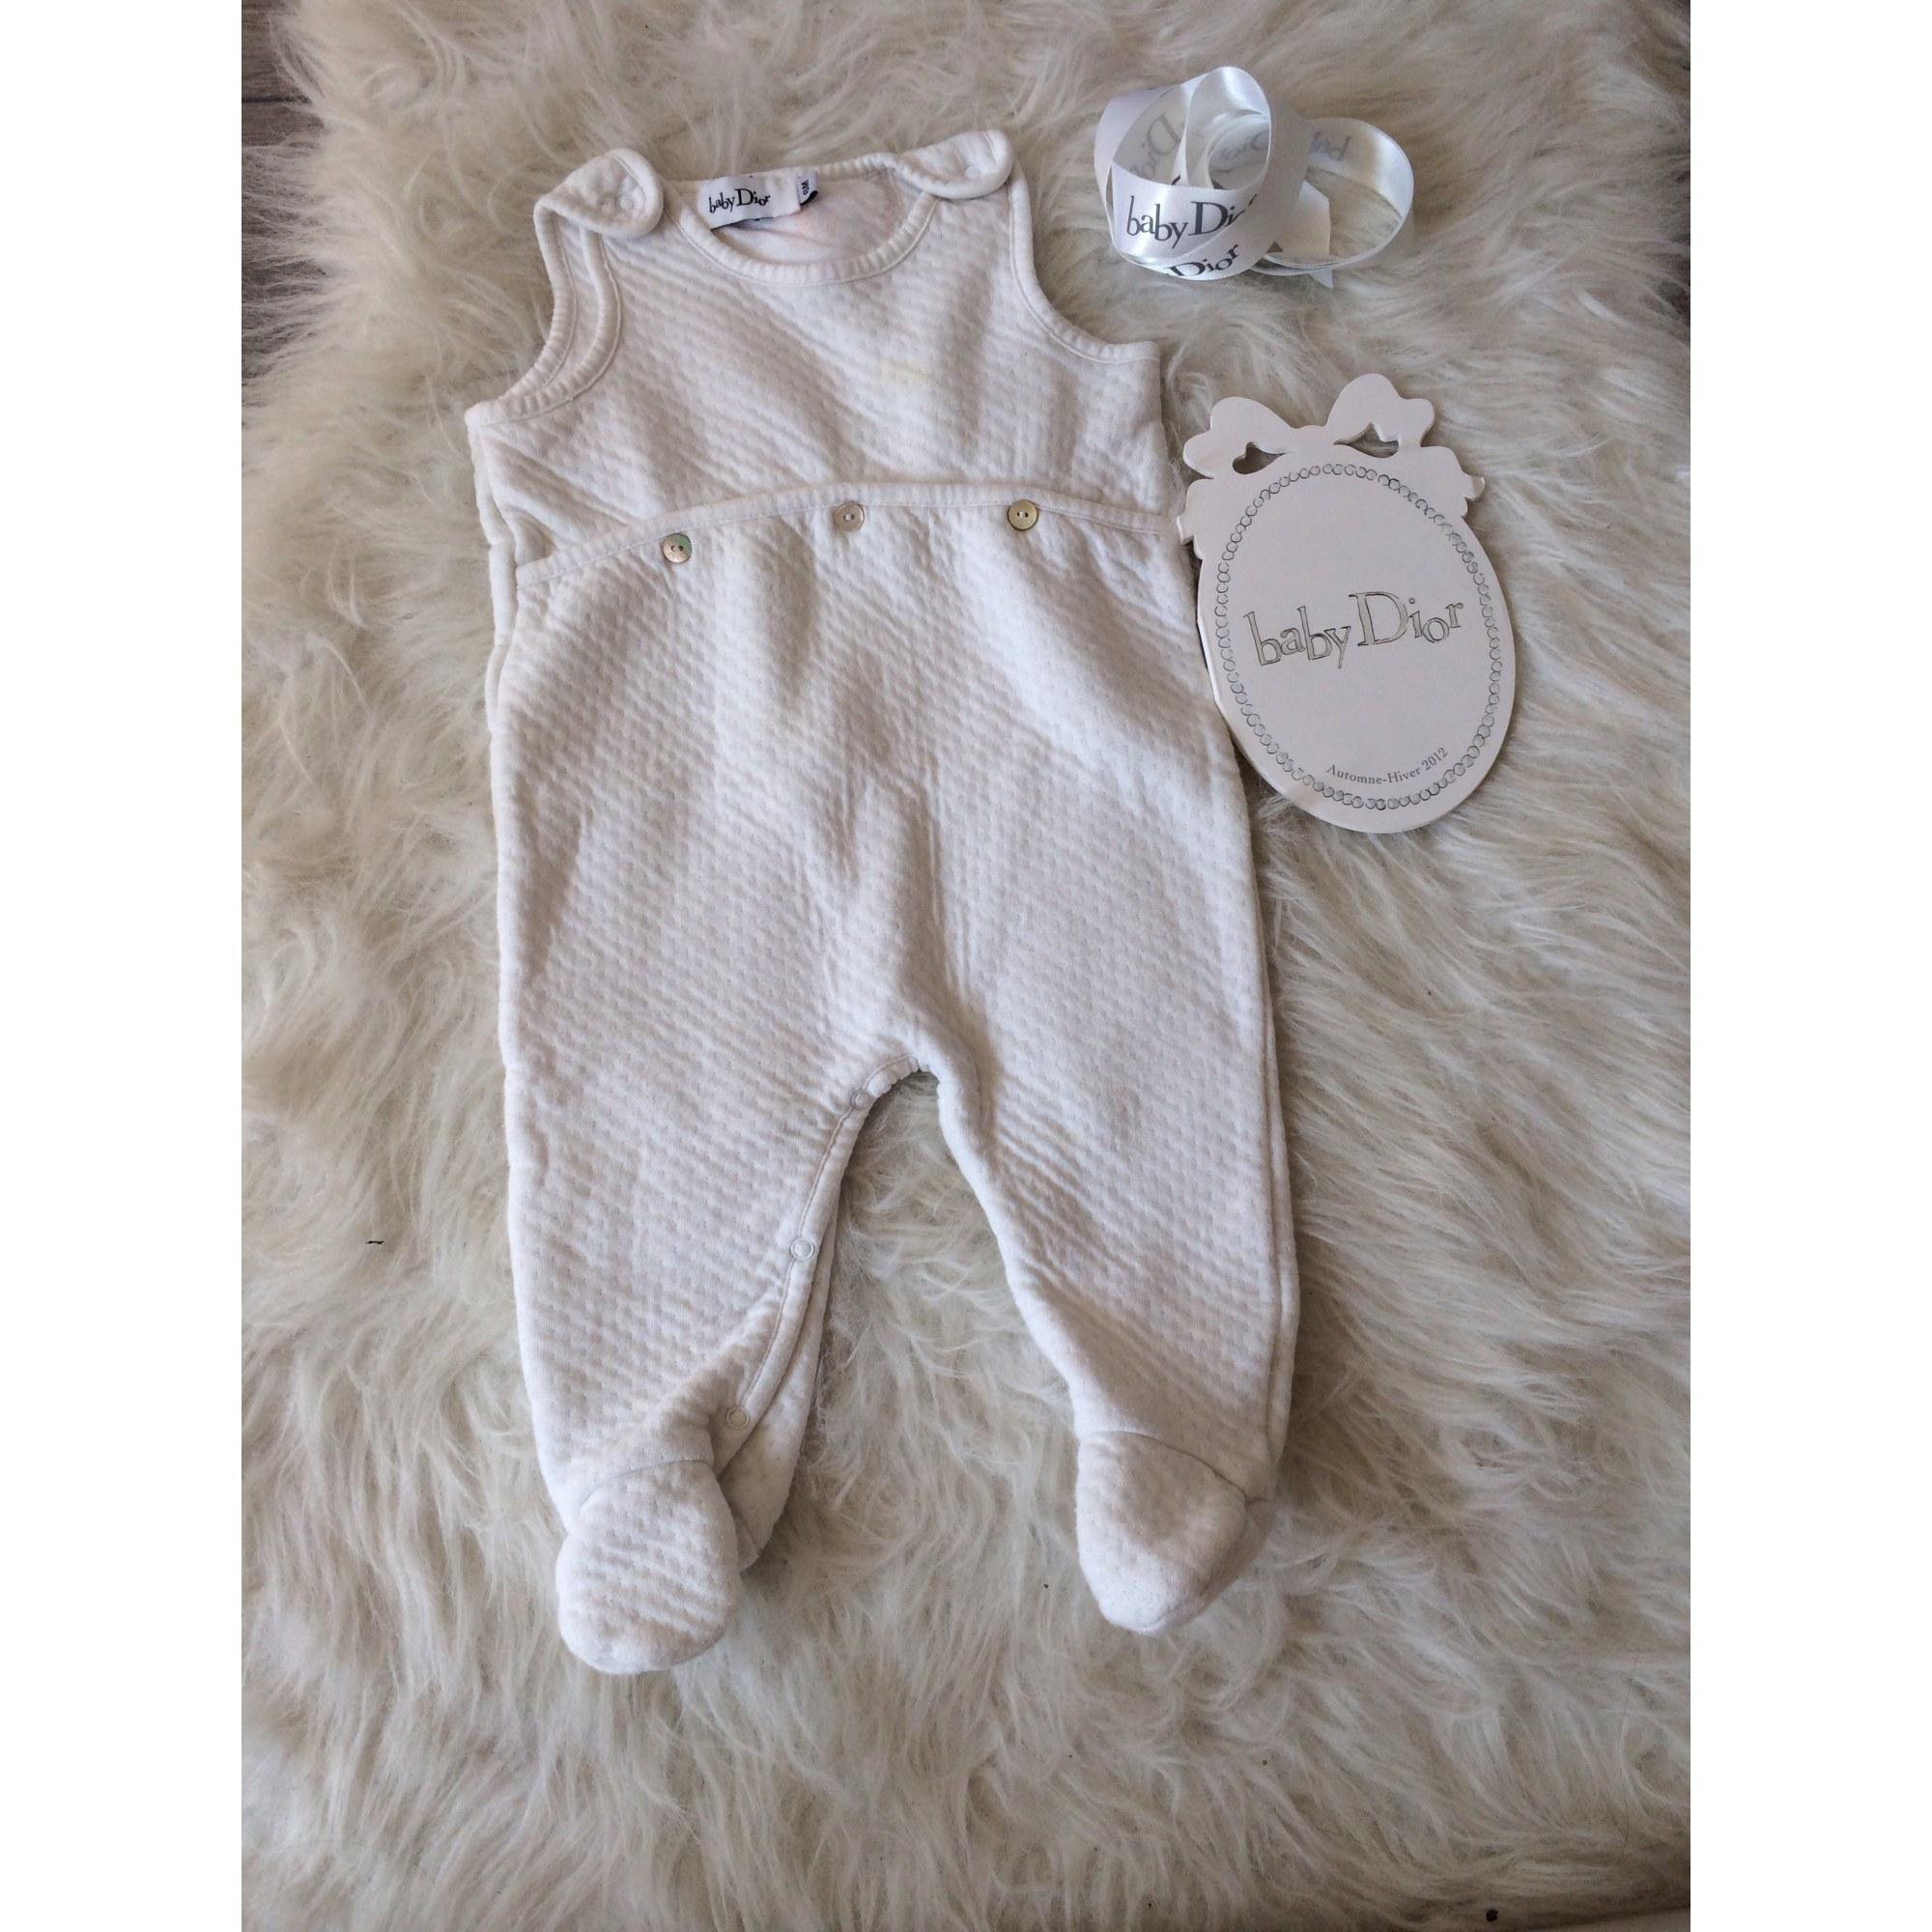 Ensemble & Combinaison pantalon BABY DIOR Blanc, blanc cassé, écru